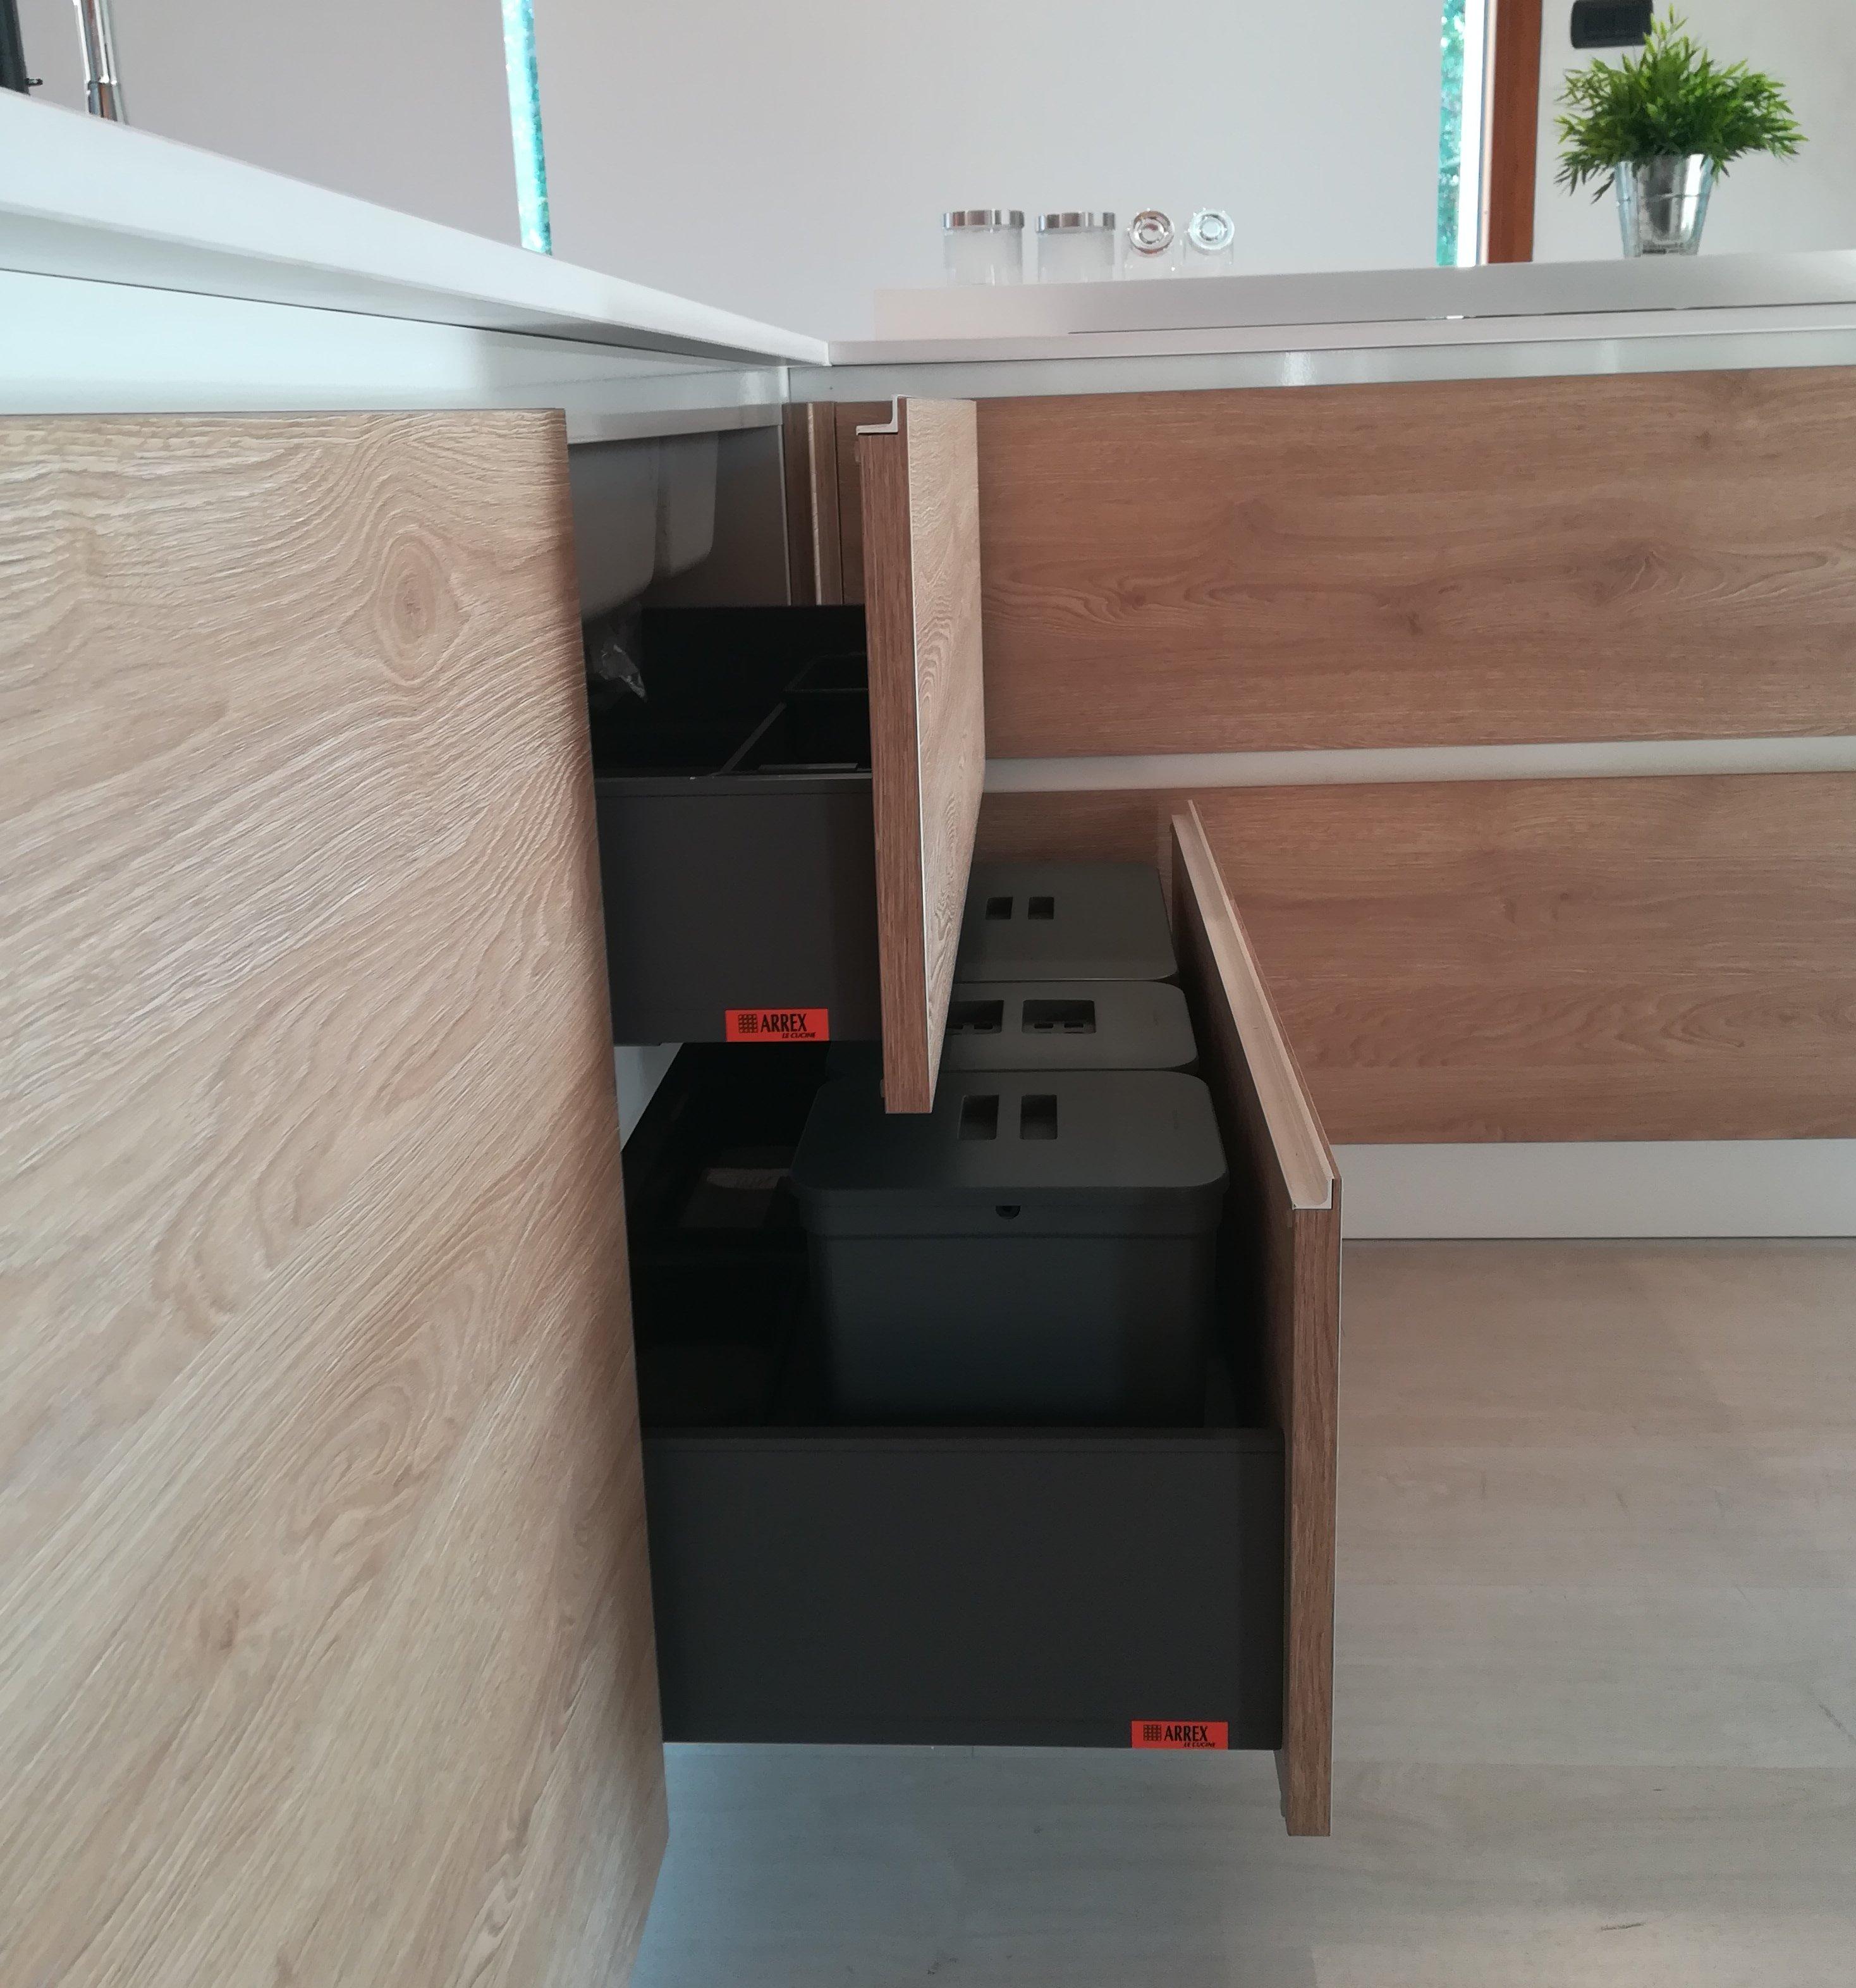 raccolta differenziata in cucina paola elisa mobili